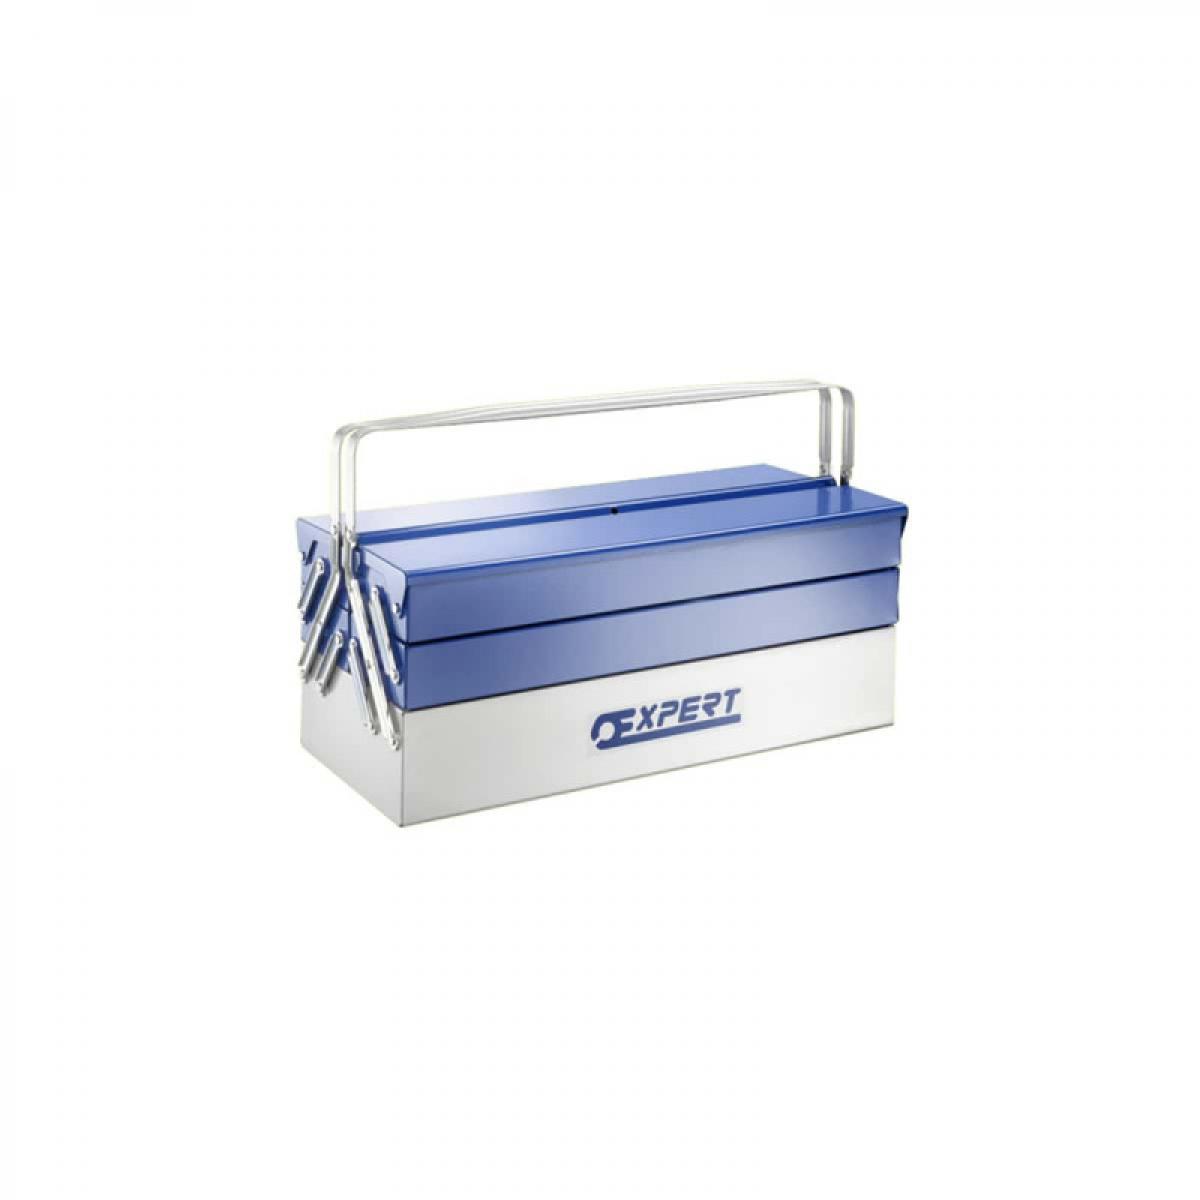 Expert Caisse à outils EXPERT BY FACOM - Métallique - 5 cases - 230x535x250mm - E010201